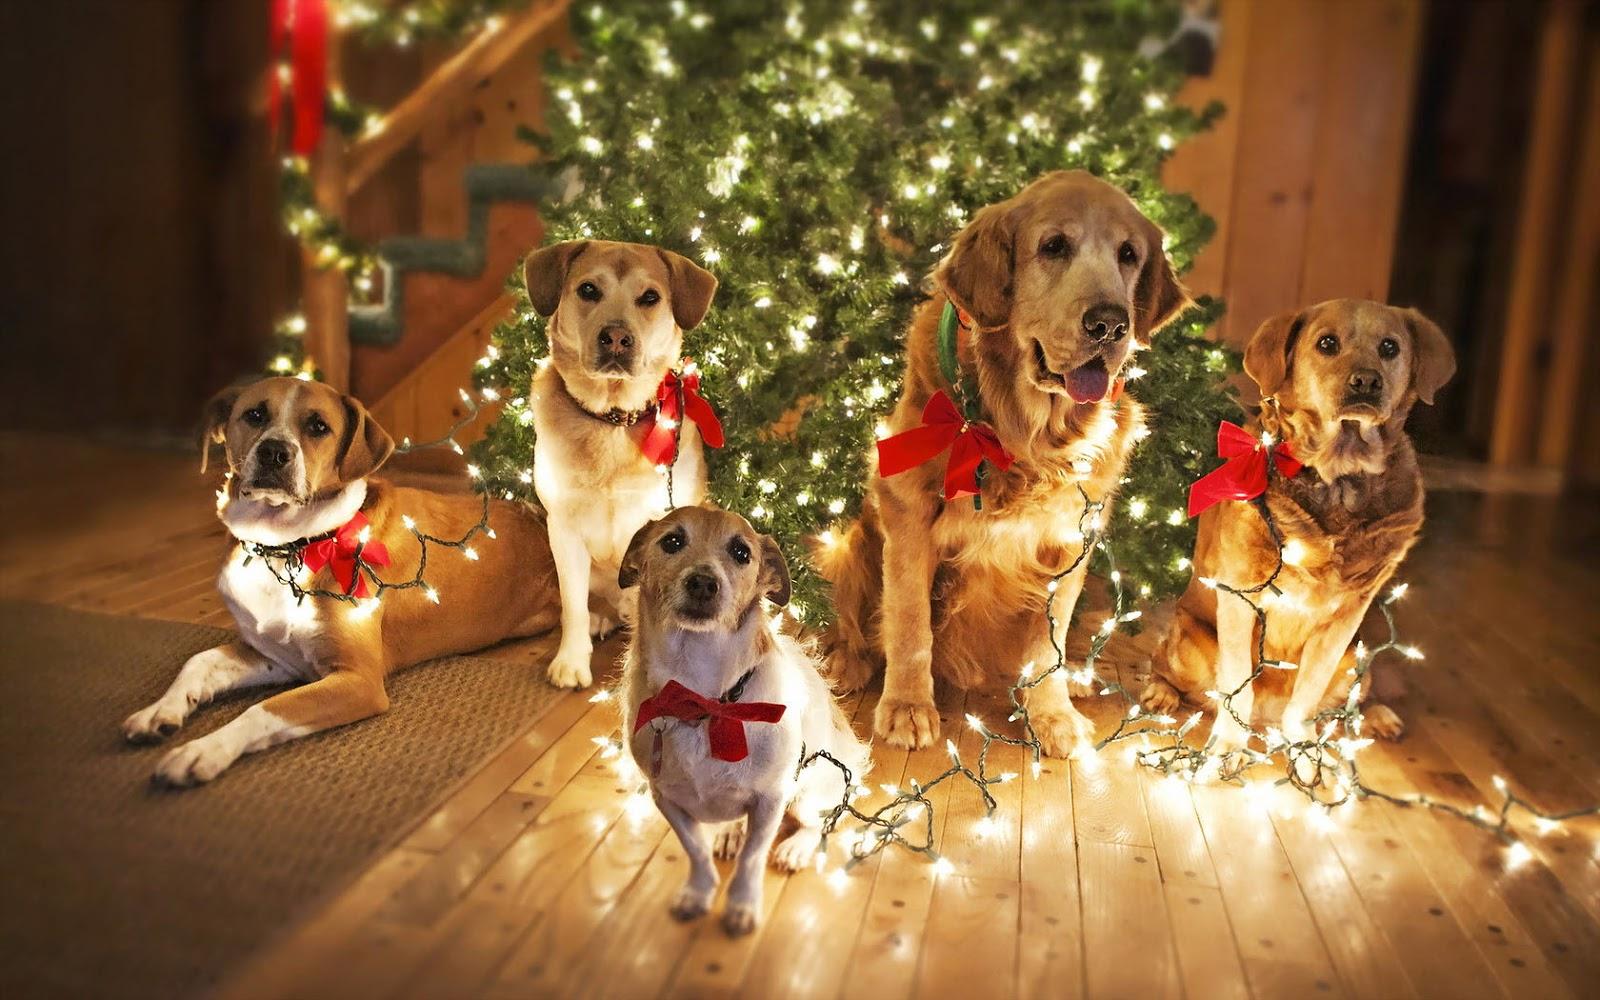 Puppy Christmas Wallpaper - WallpaperSafari